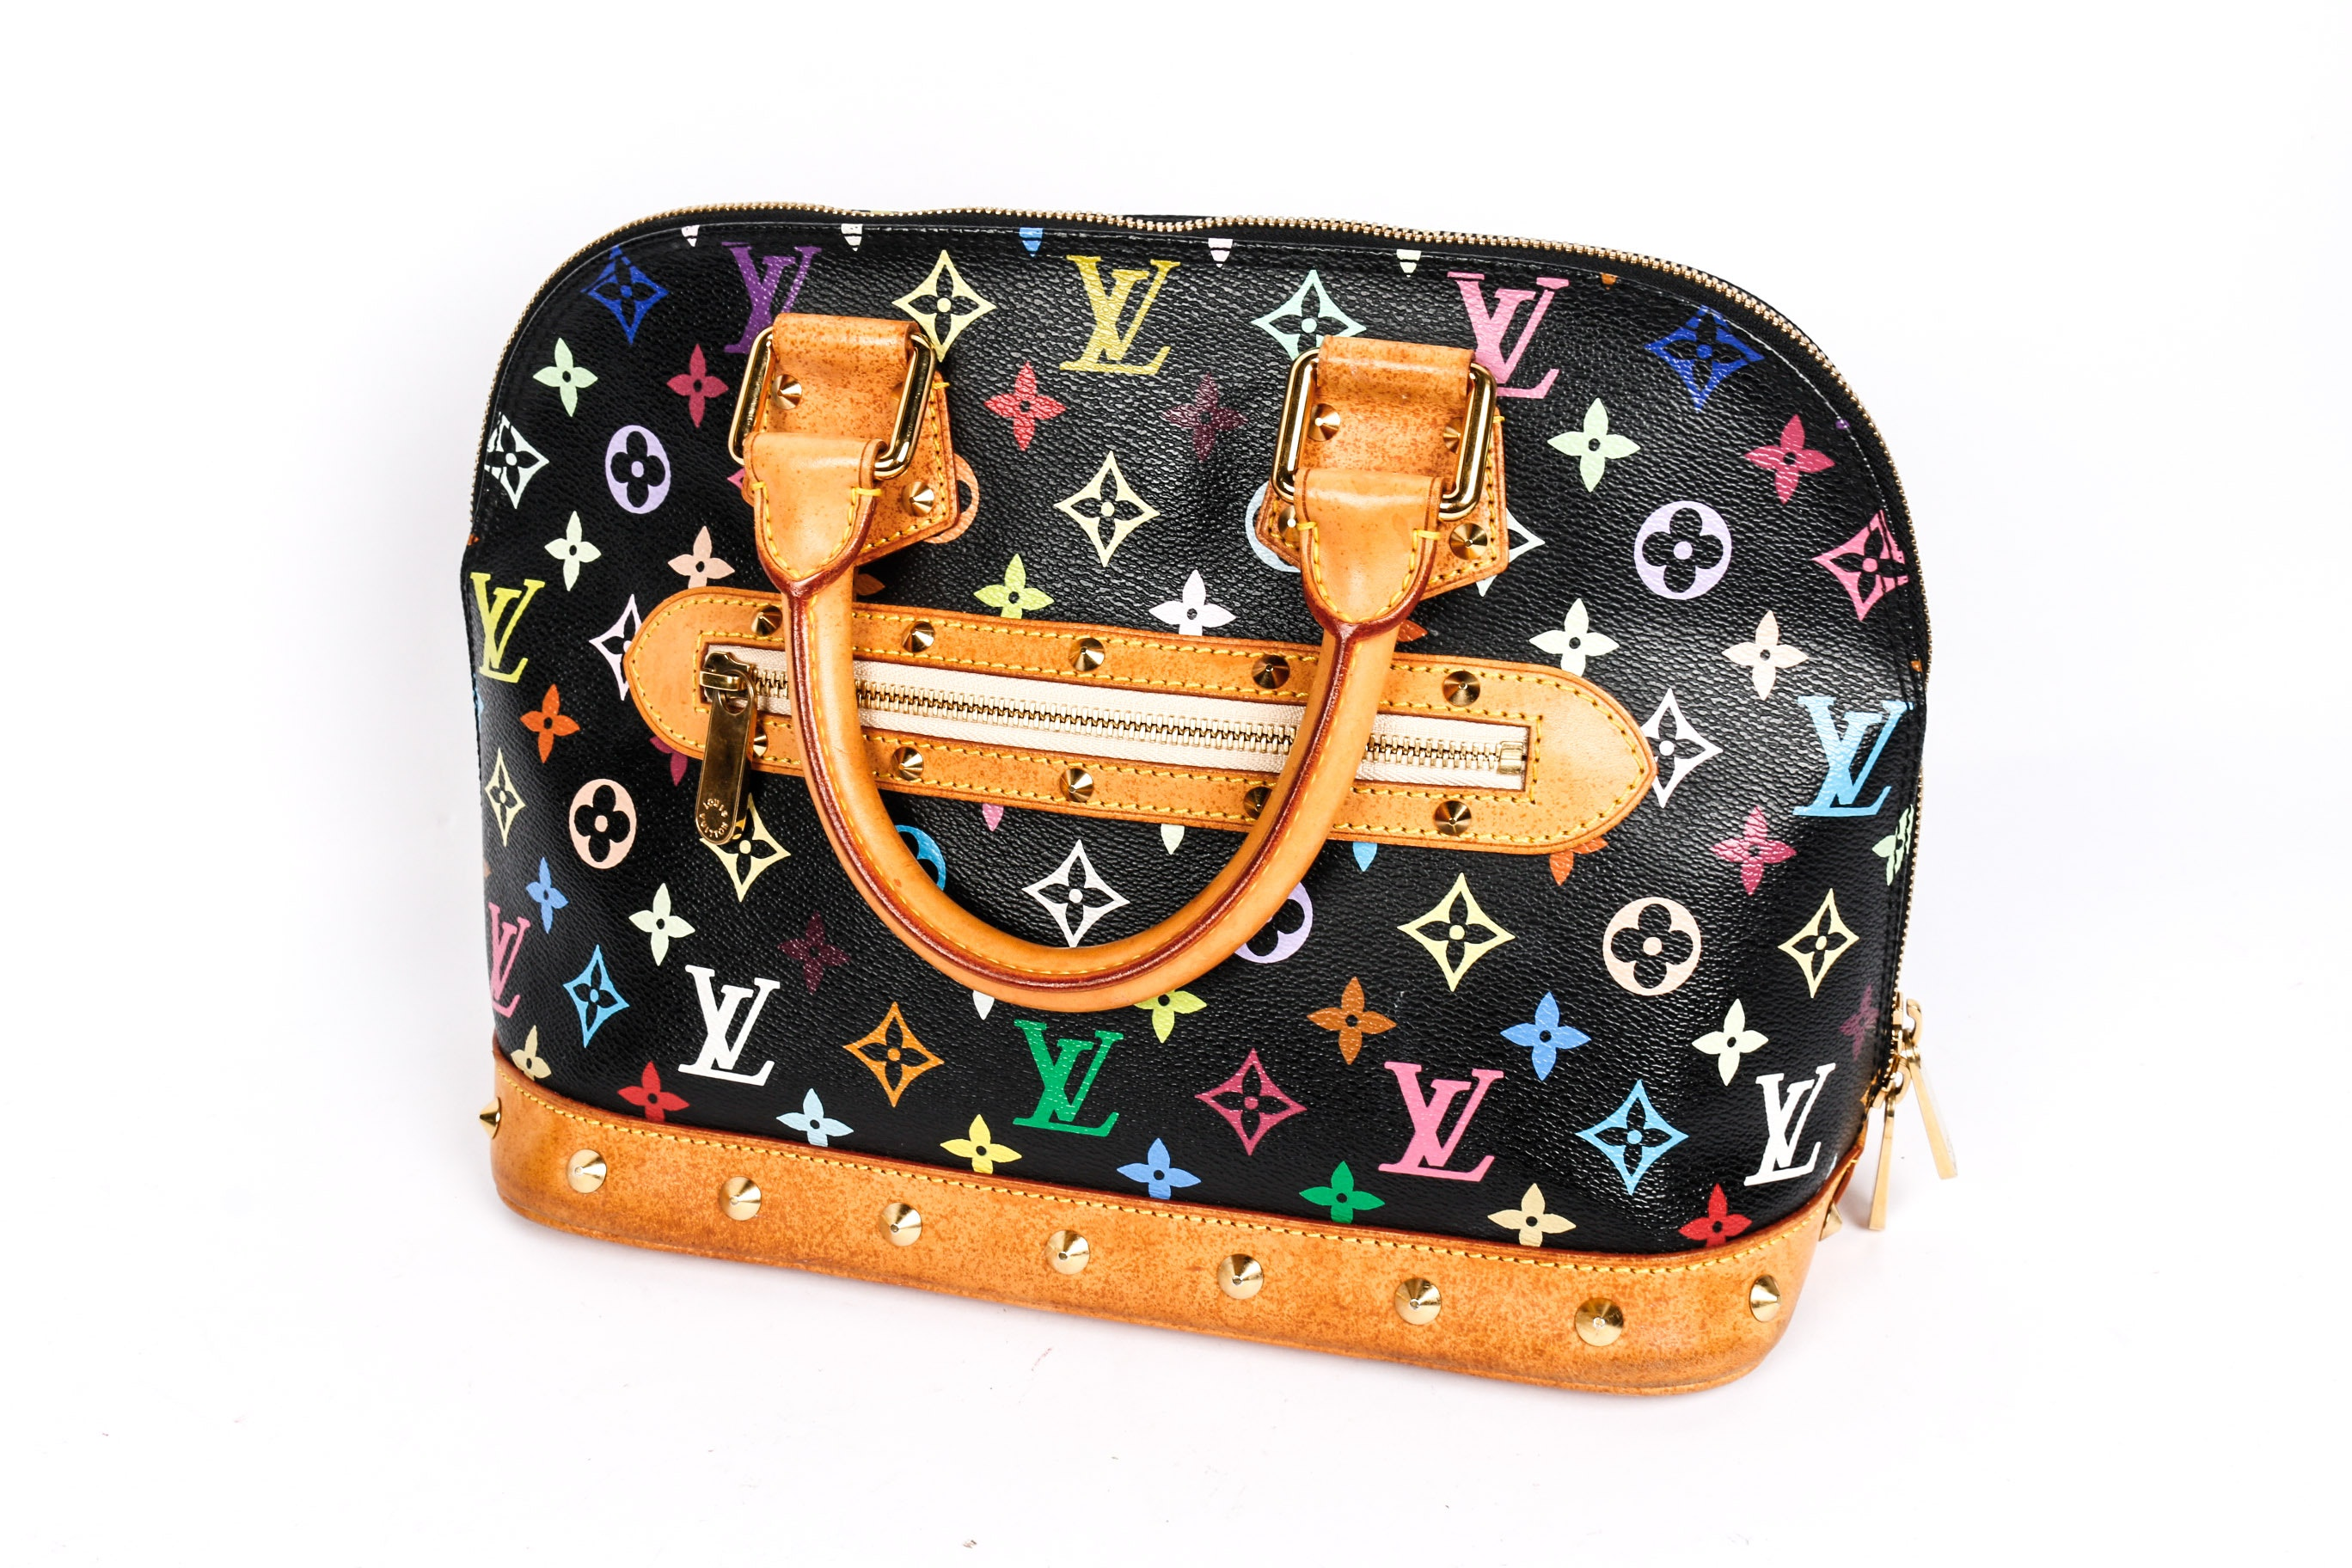 Louis Vuitton Multicolor Alma Noir Handbag